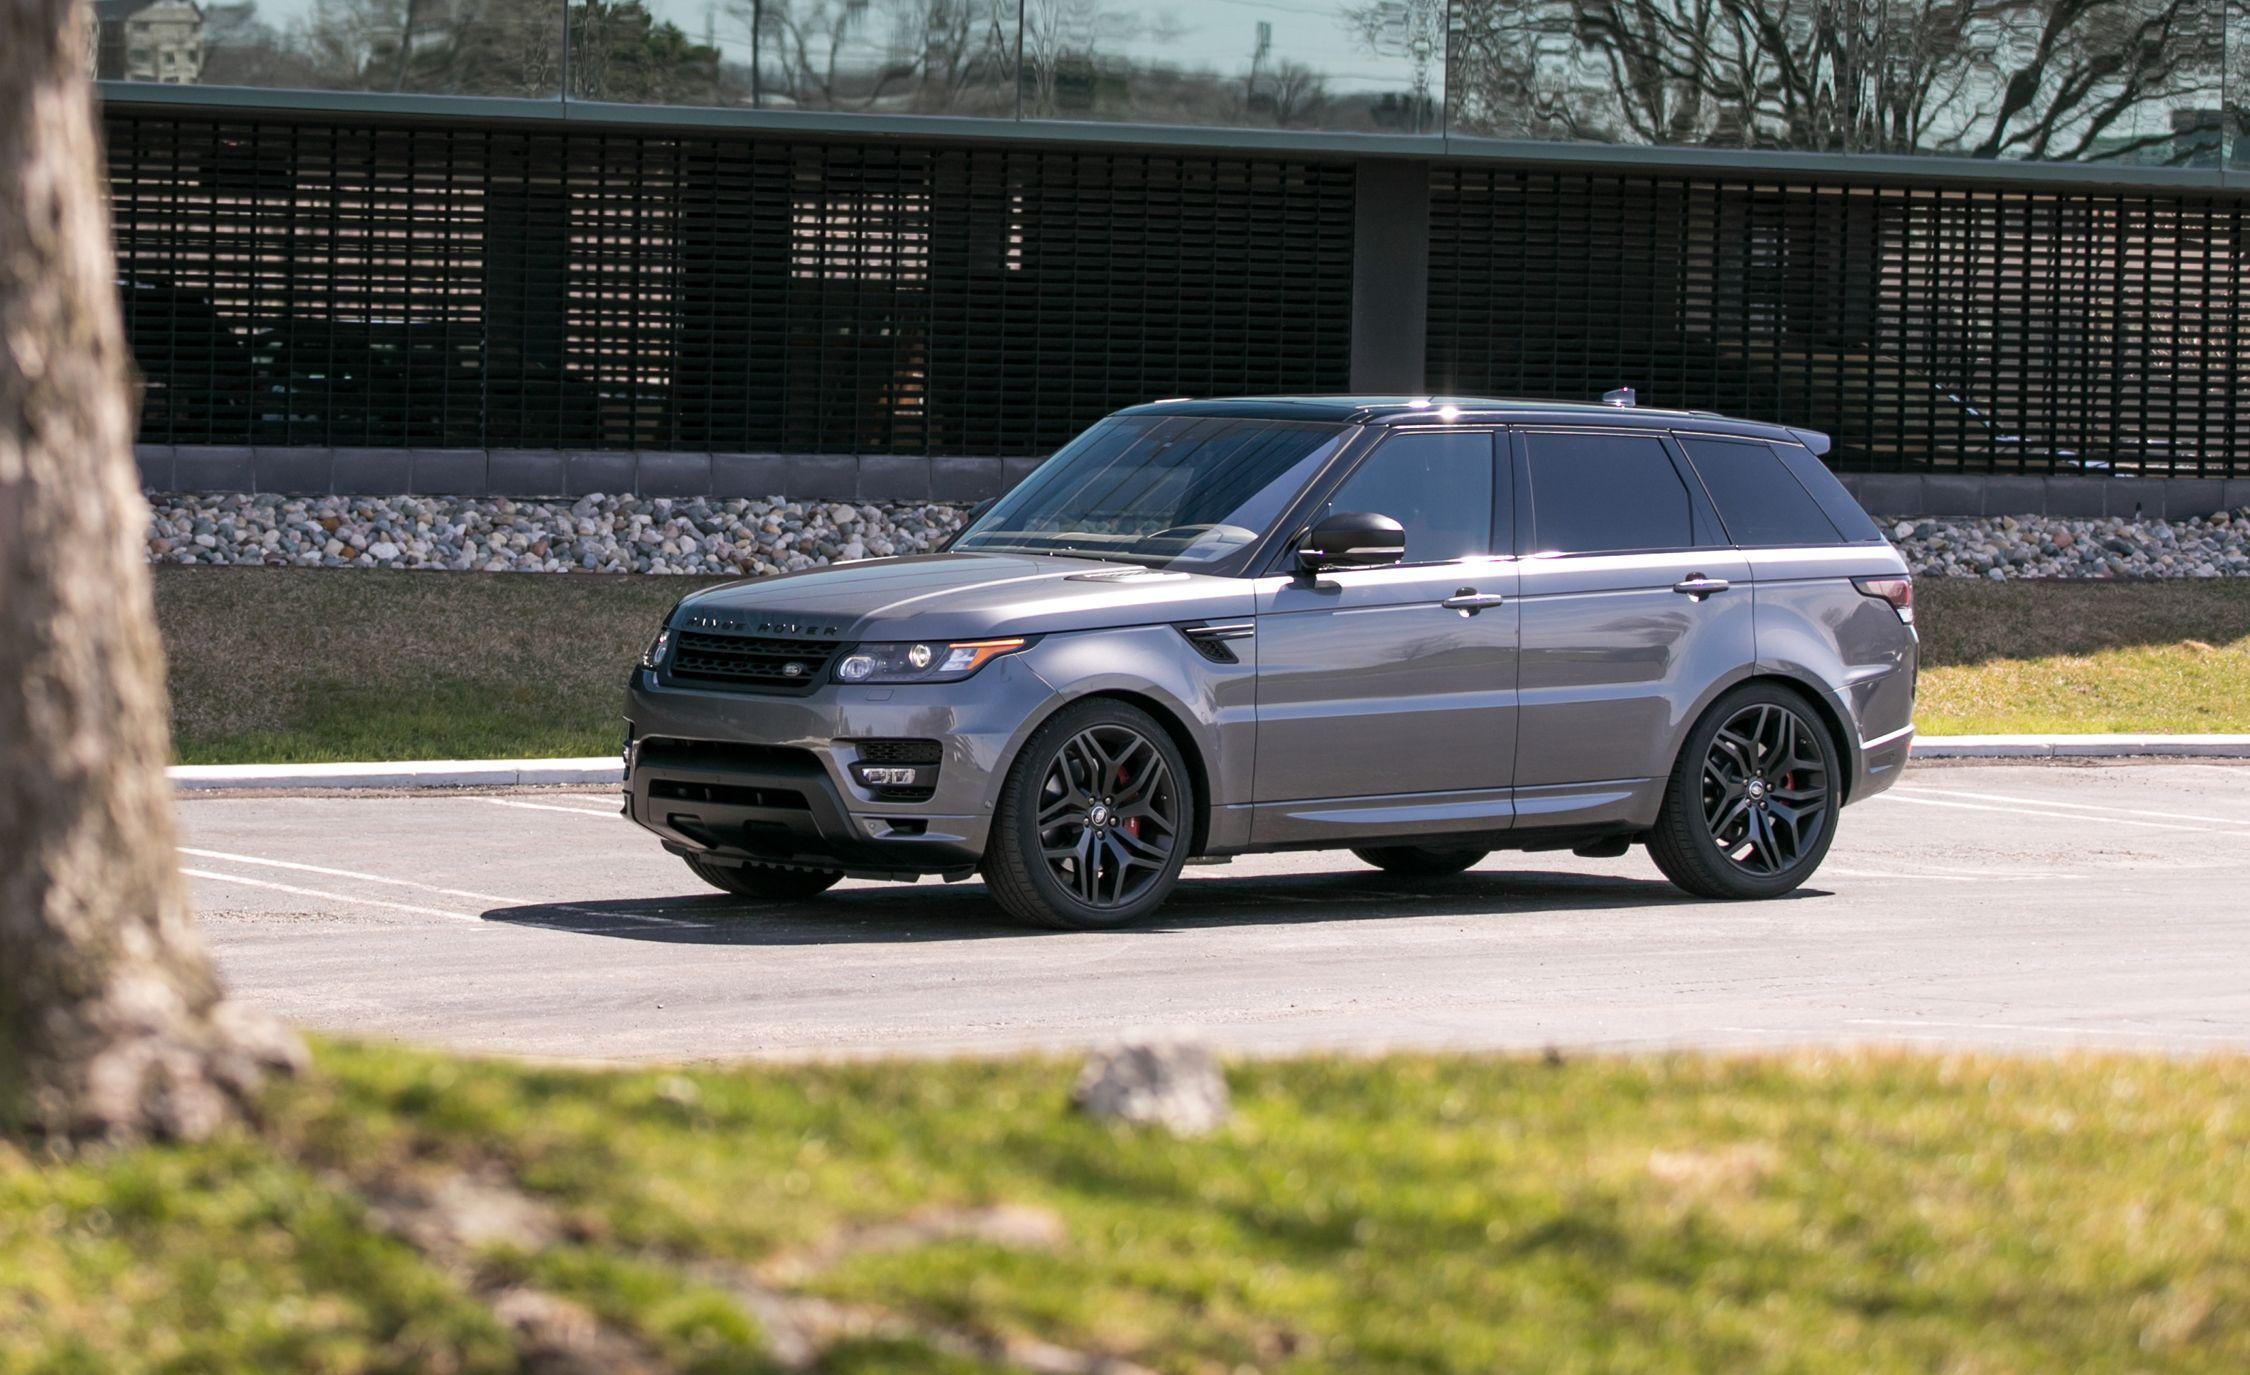 2017 Land Rover Range Rover Sport Supercharged SVR